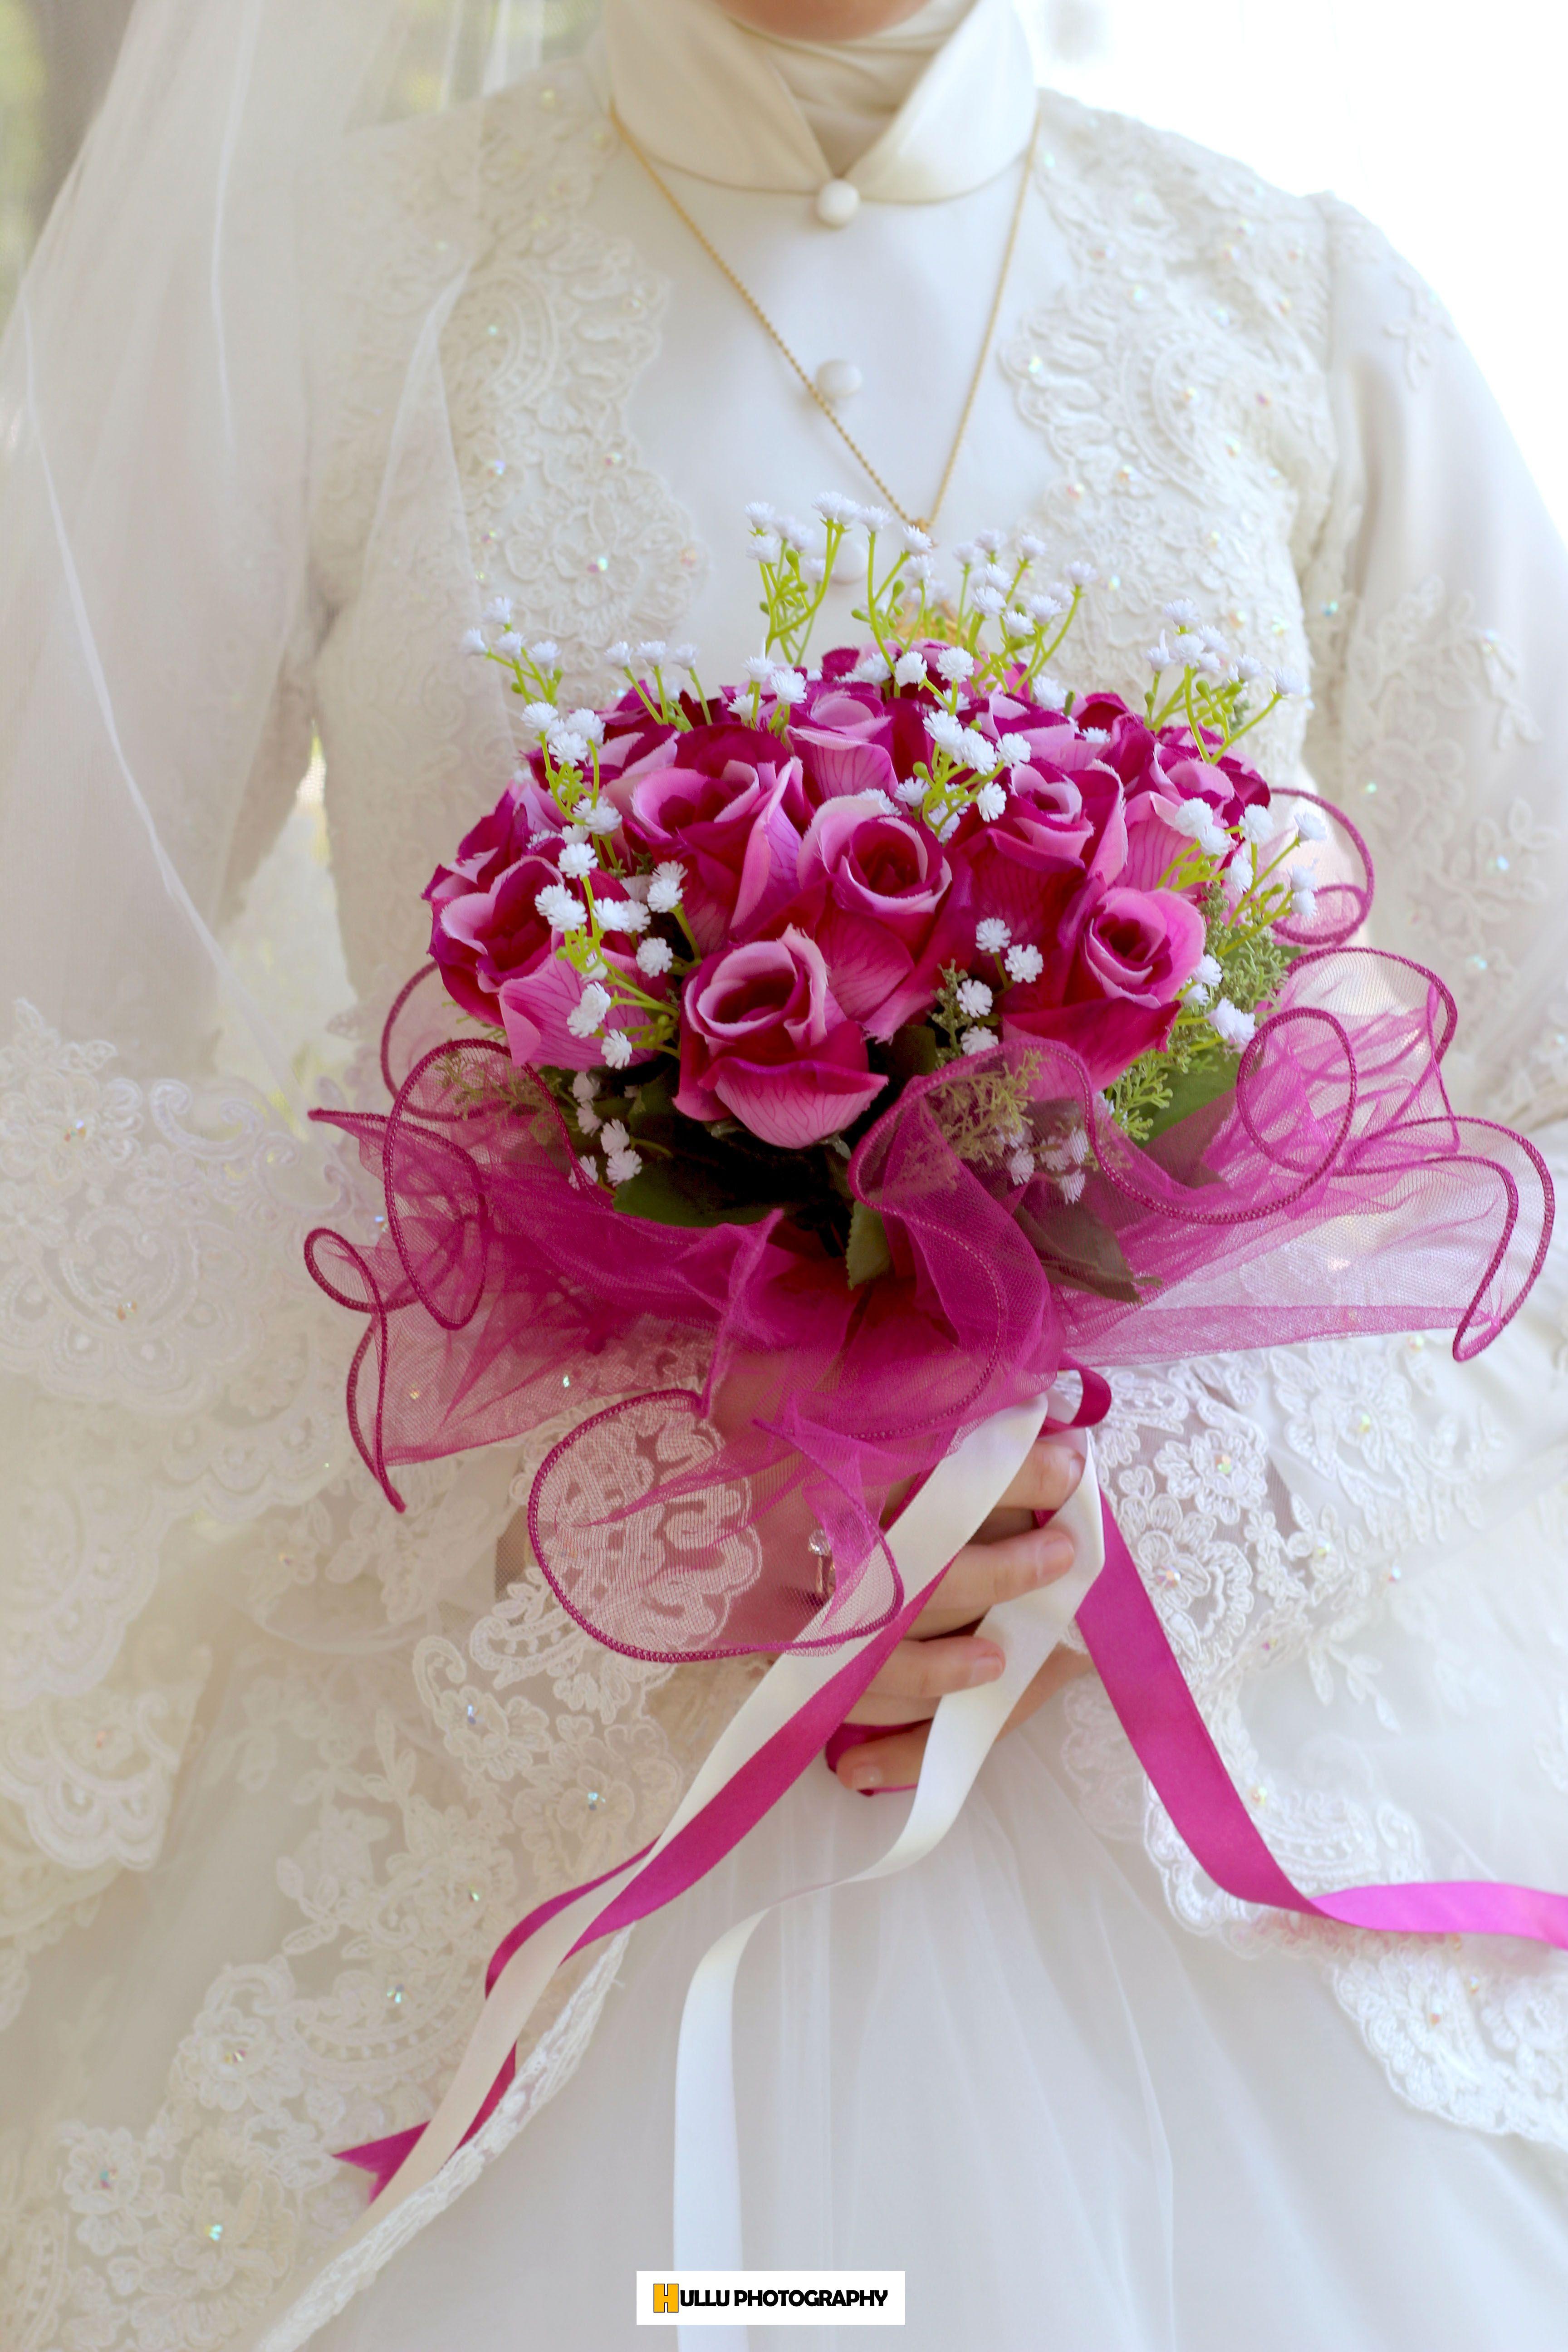 Vildan & Bayram | WEDDING PHOTOGRAPHY | Pinterest | Weddings